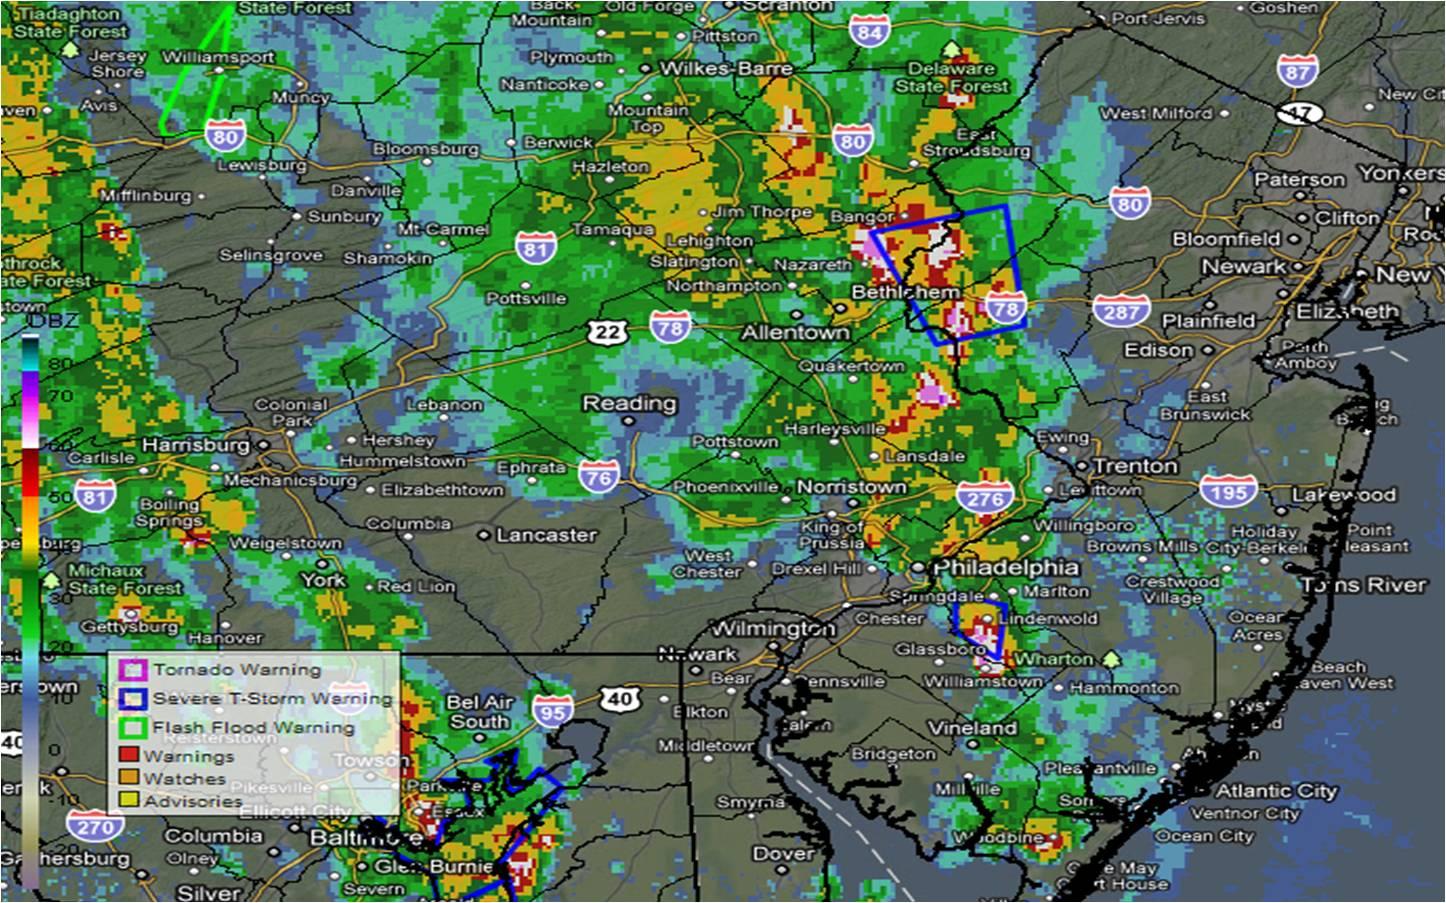 weathercoats nj weather severe thunderstorm warnings